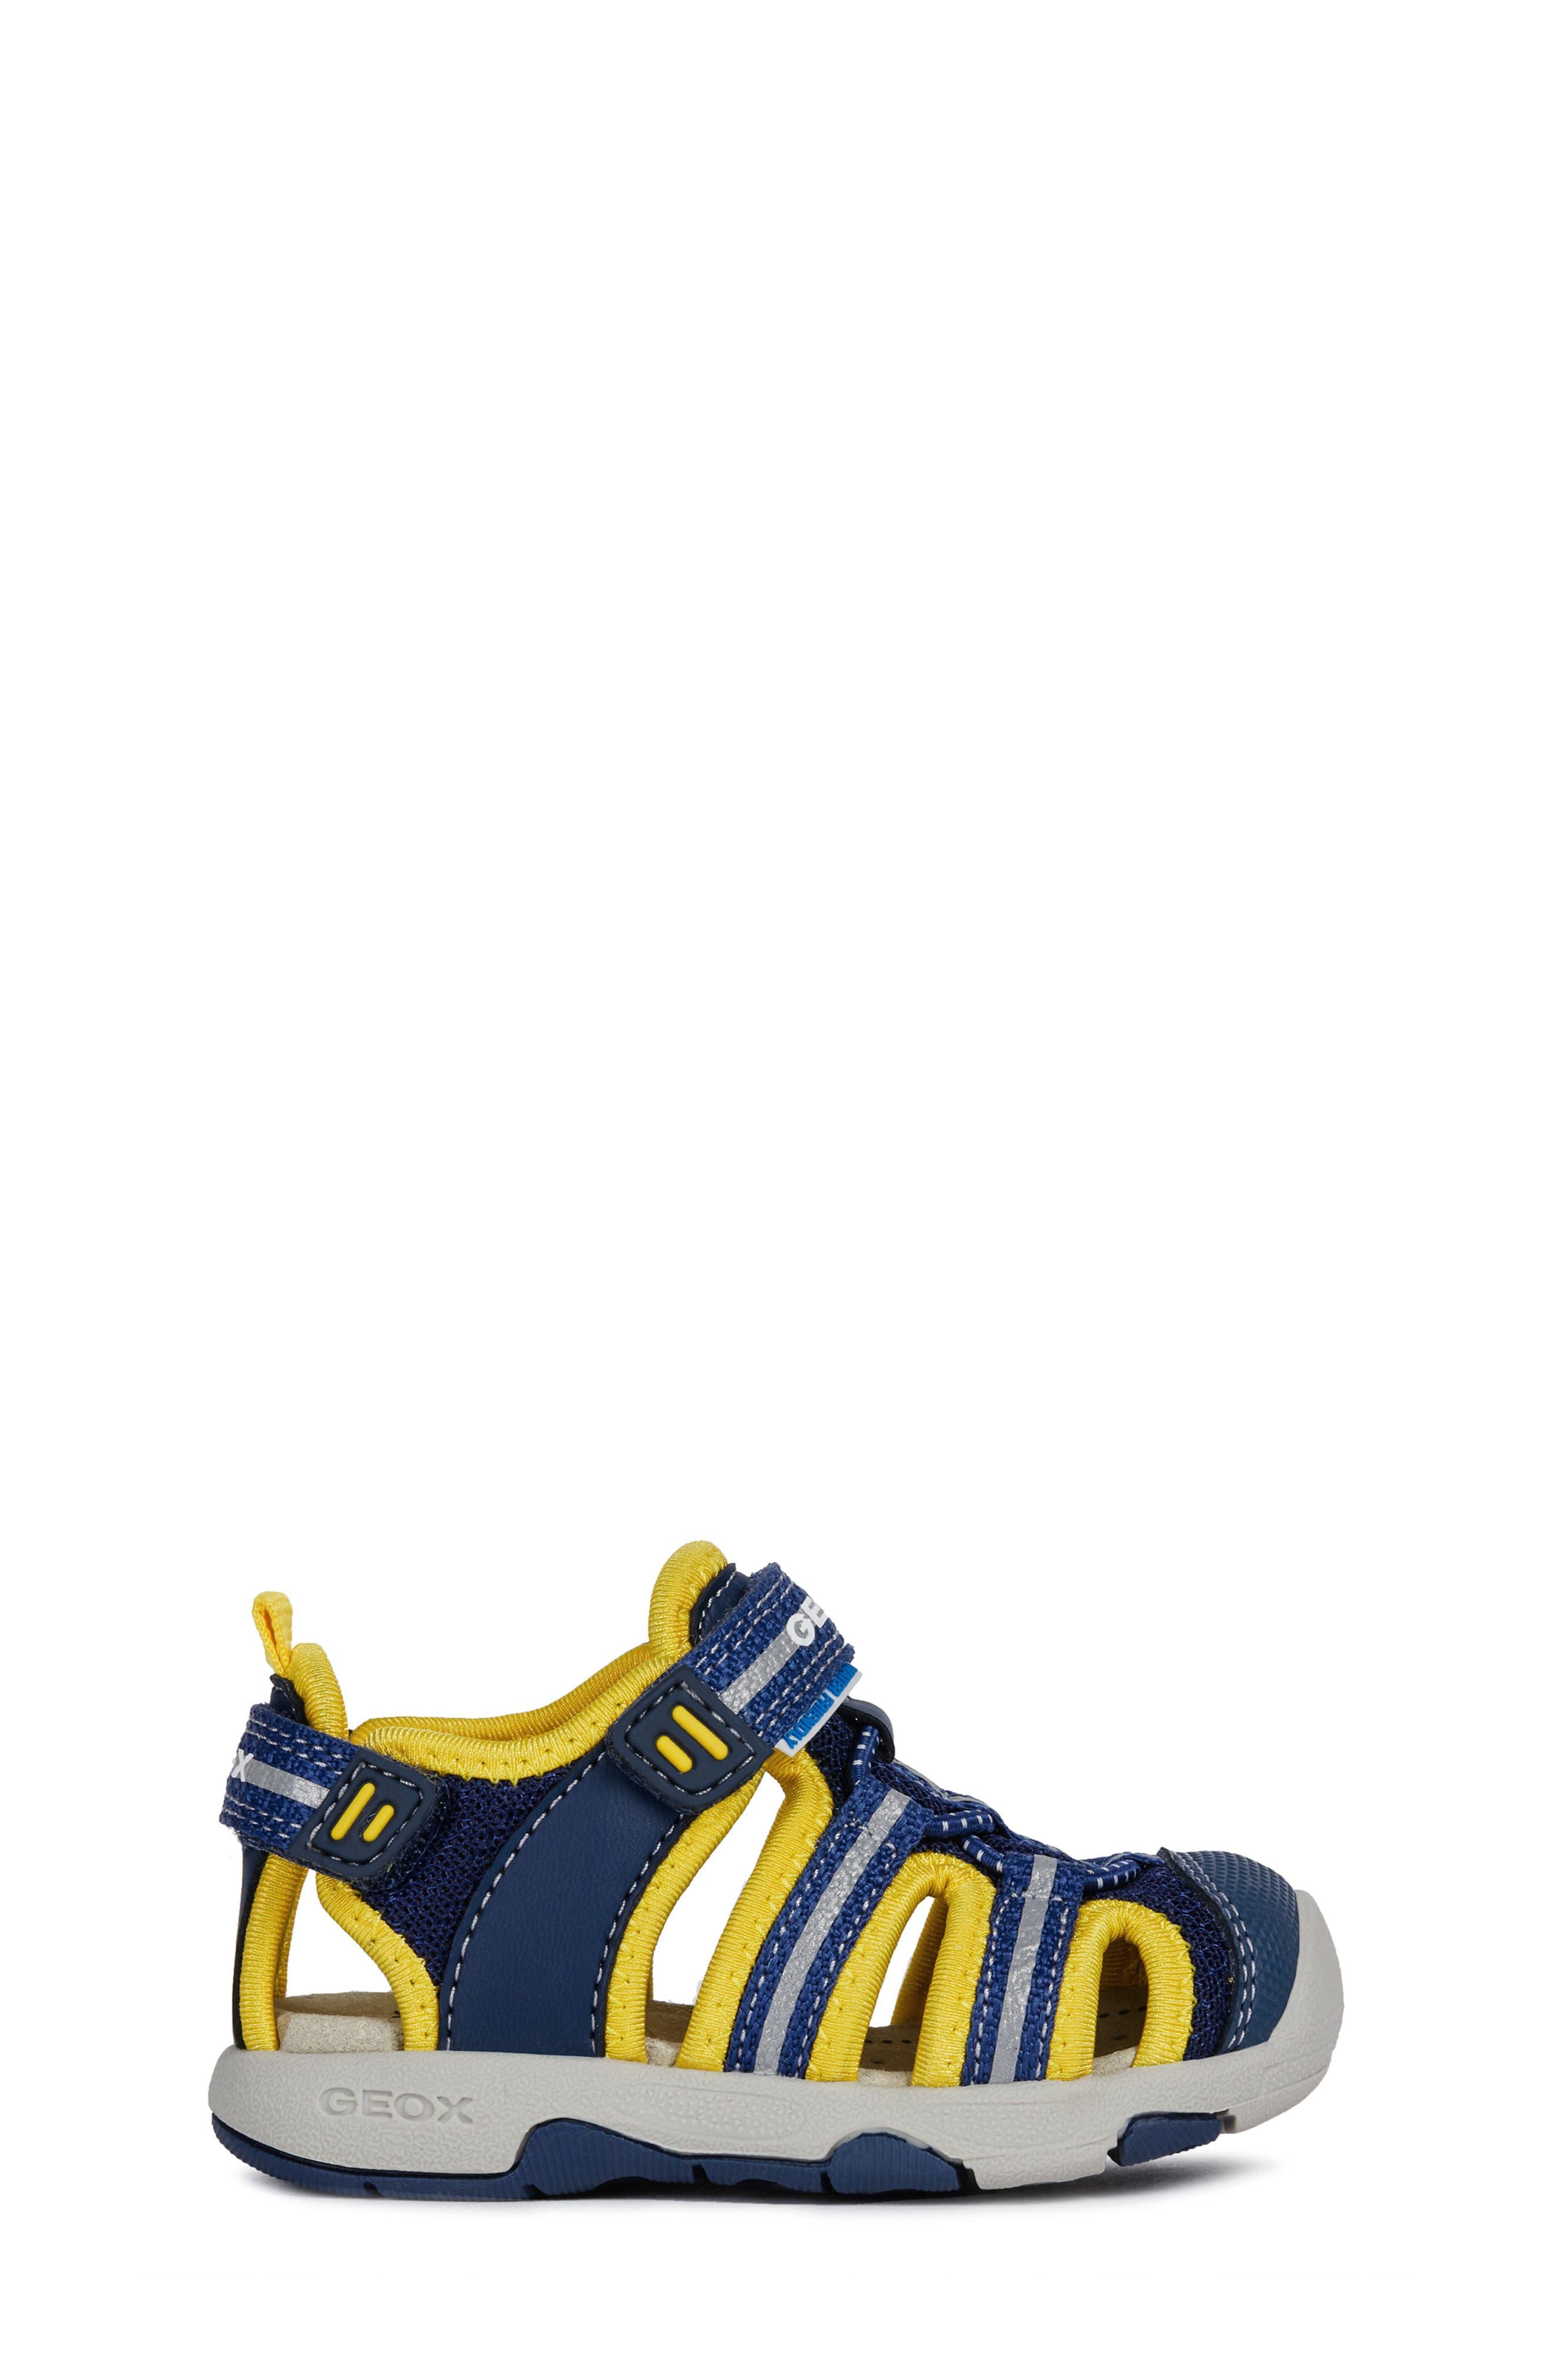 Multy Water Friendly Sandal,                             Alternate thumbnail 3, color,                             NAVY/ YELLOW